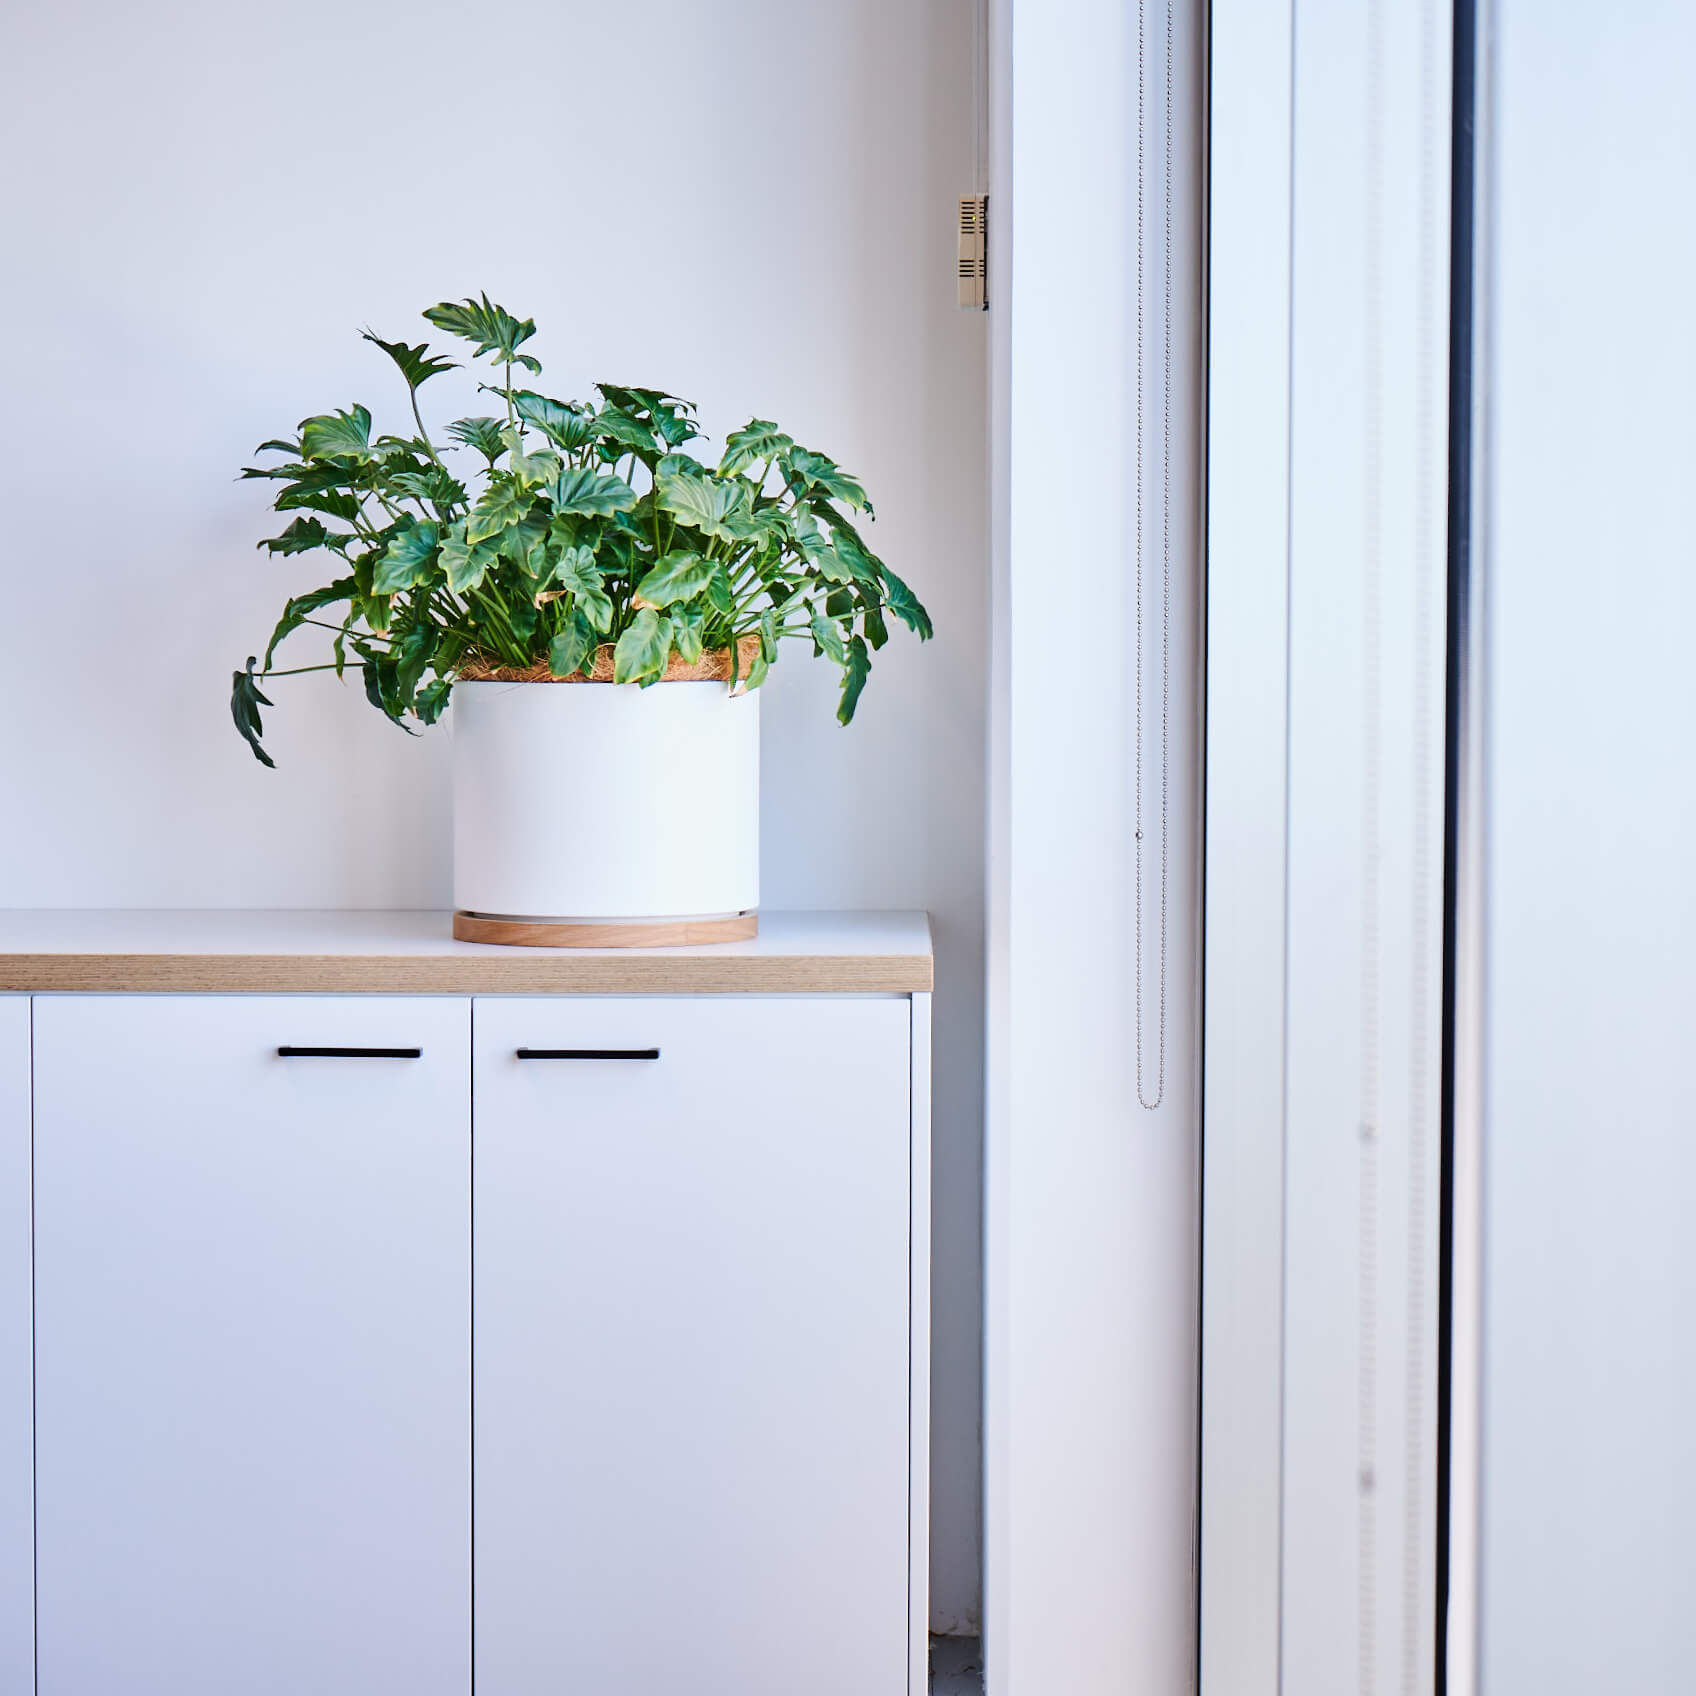 portfolio-offices-spaces-mitchellvranges-image3